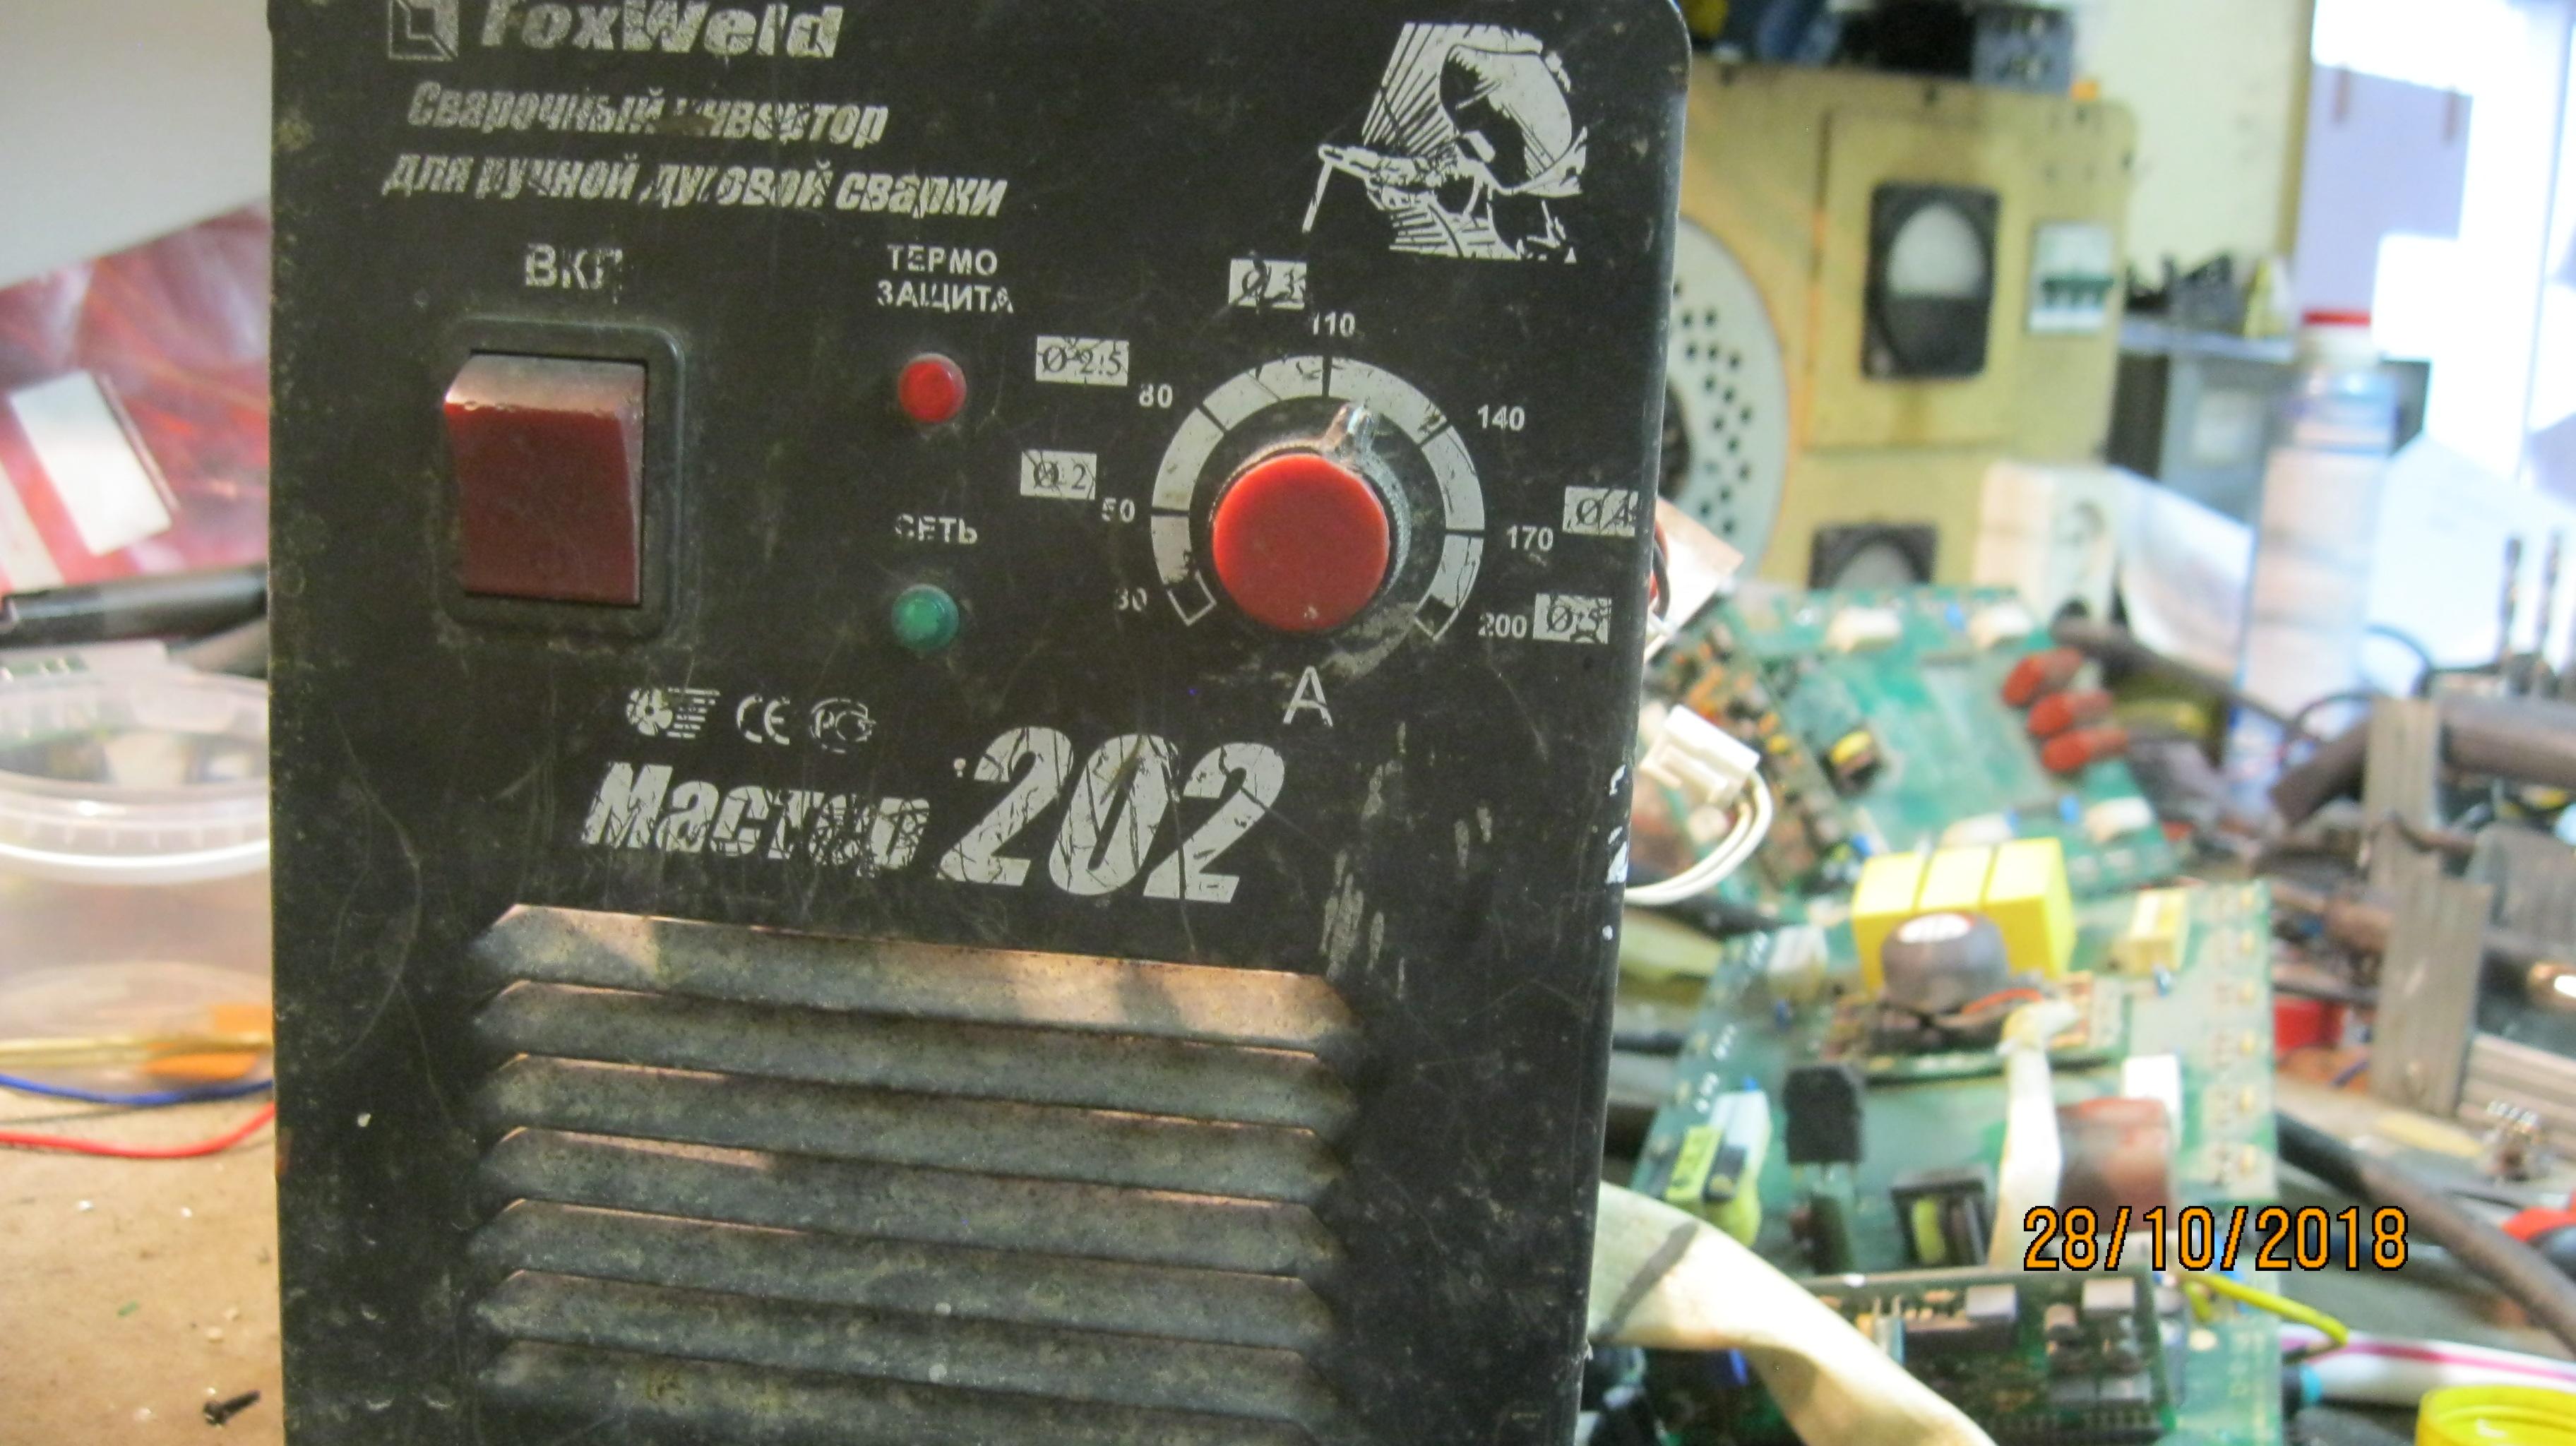 Ремонт сварочного аппарата FoXWeld Мастер 202 в Рязани